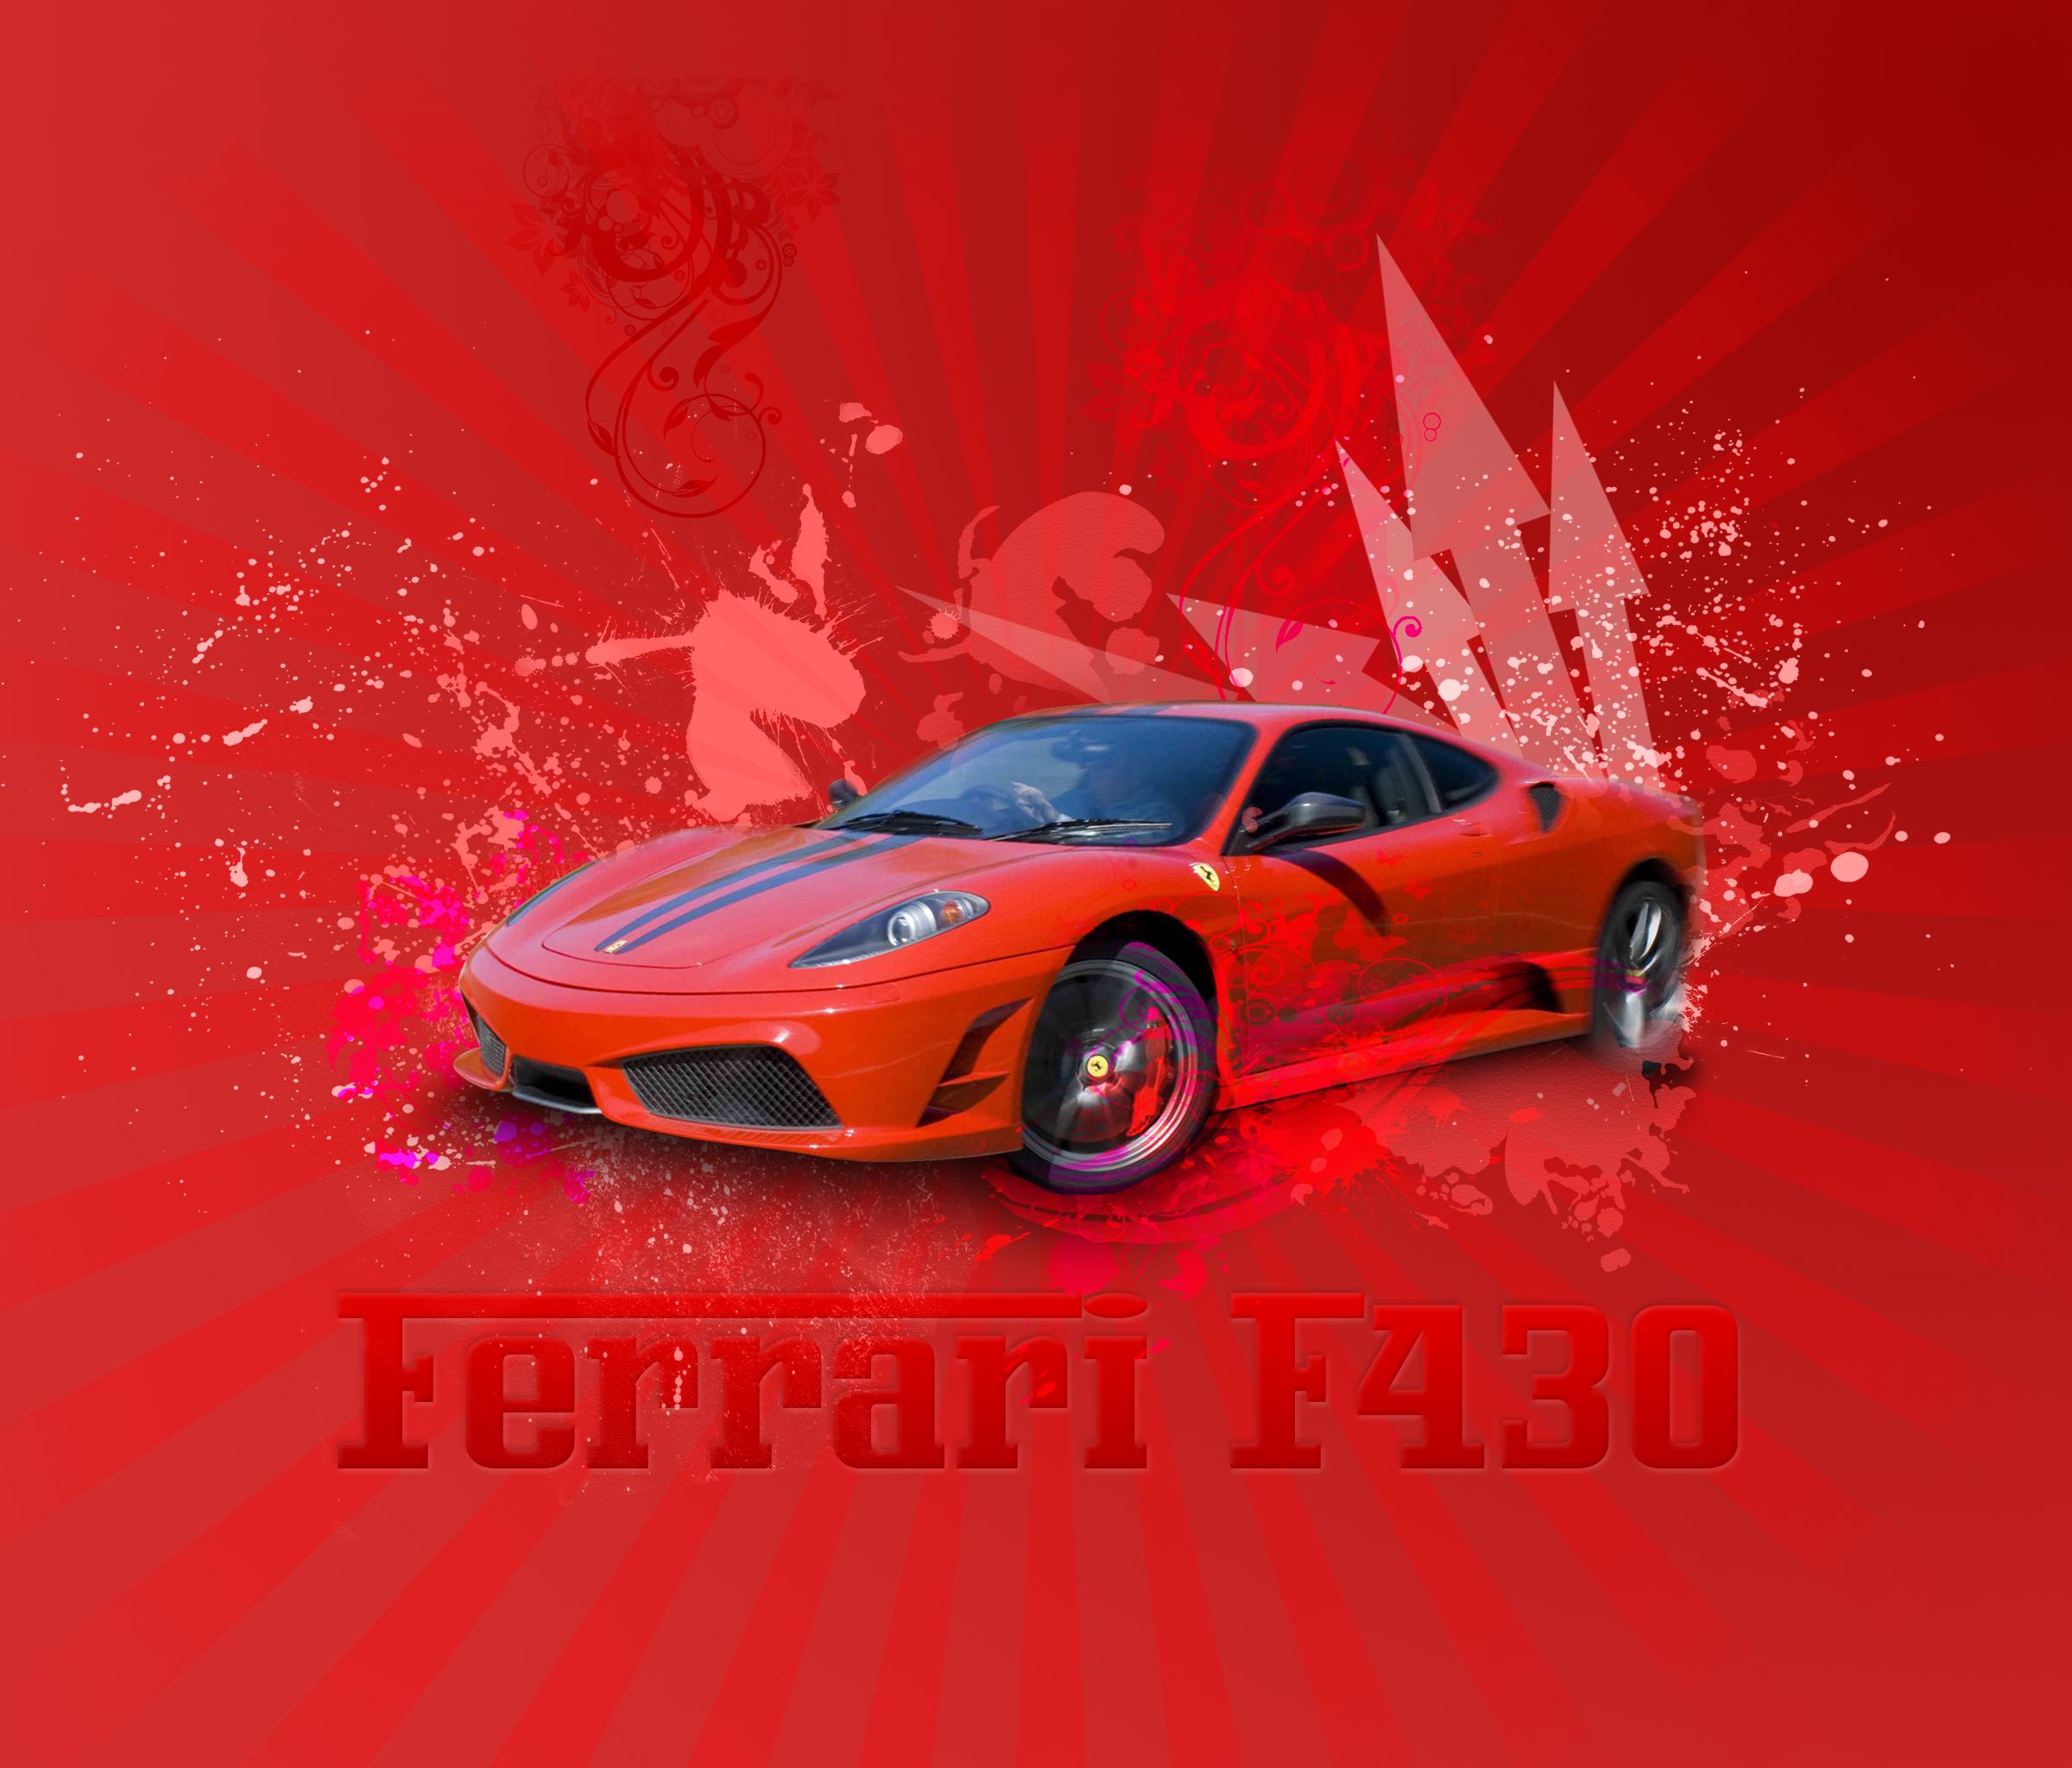 Ferrari F430 Wallpaper By MitakoBG On DeviantART